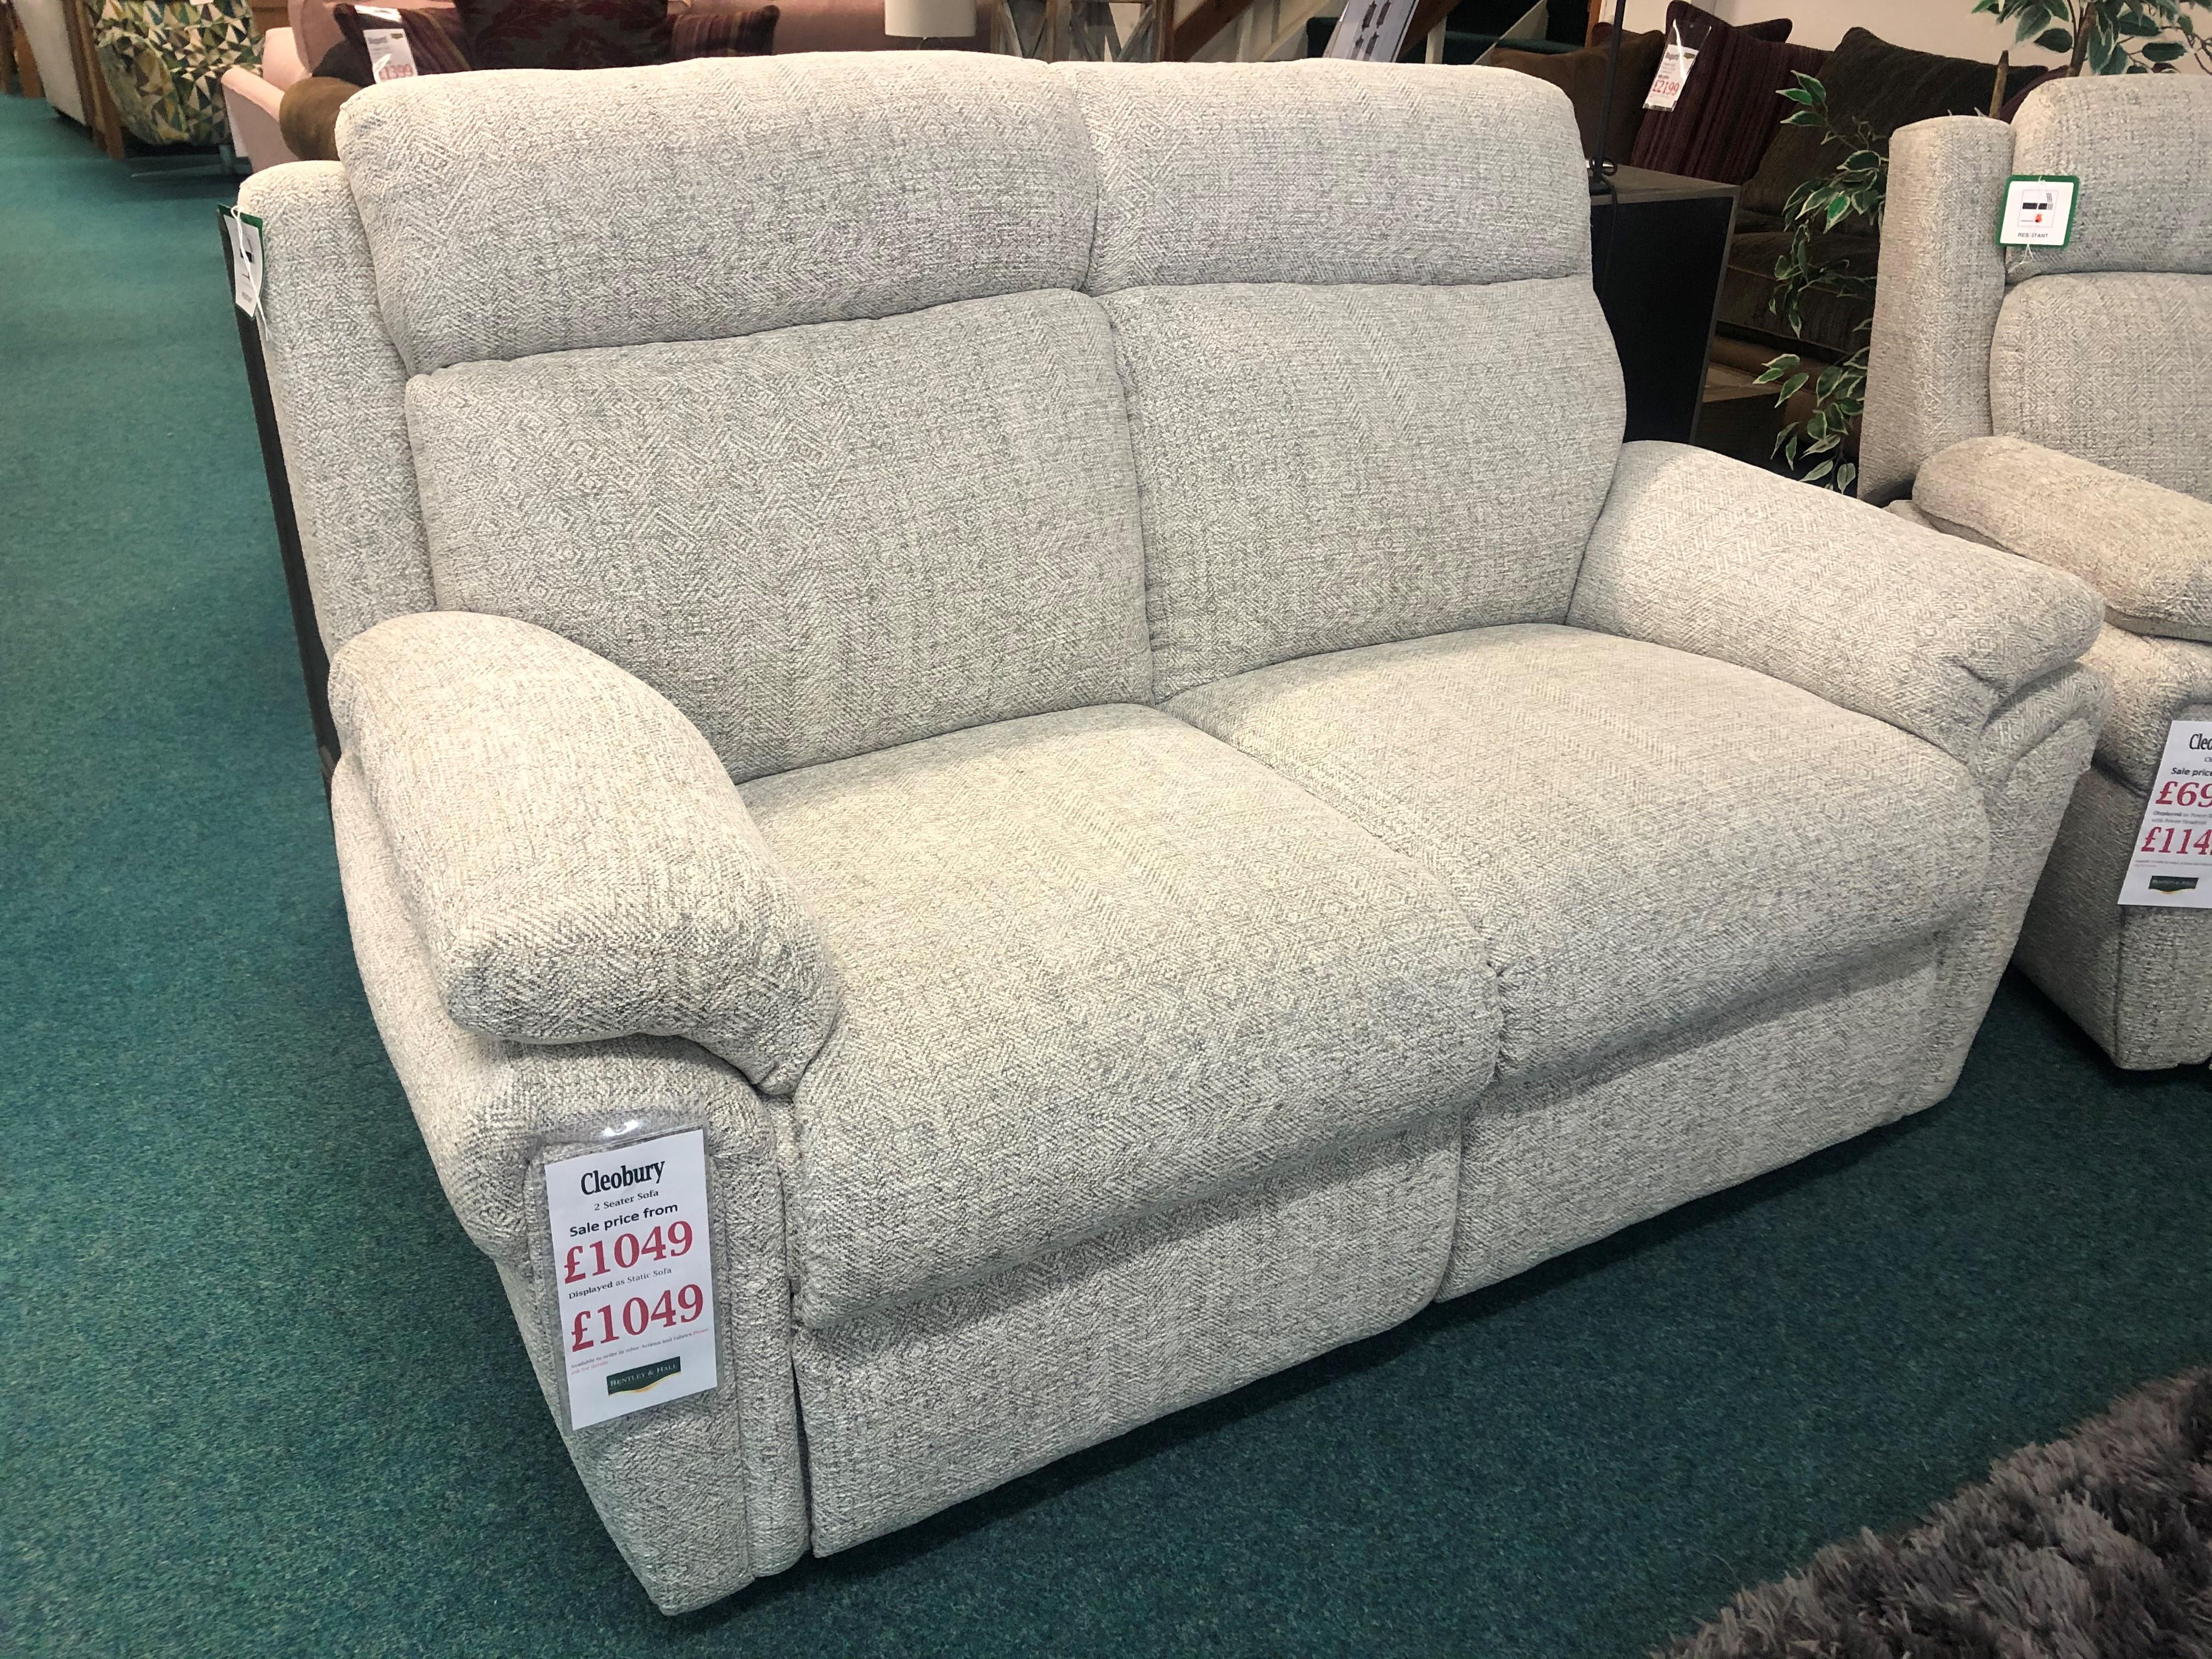 Cleobury Small Sofa